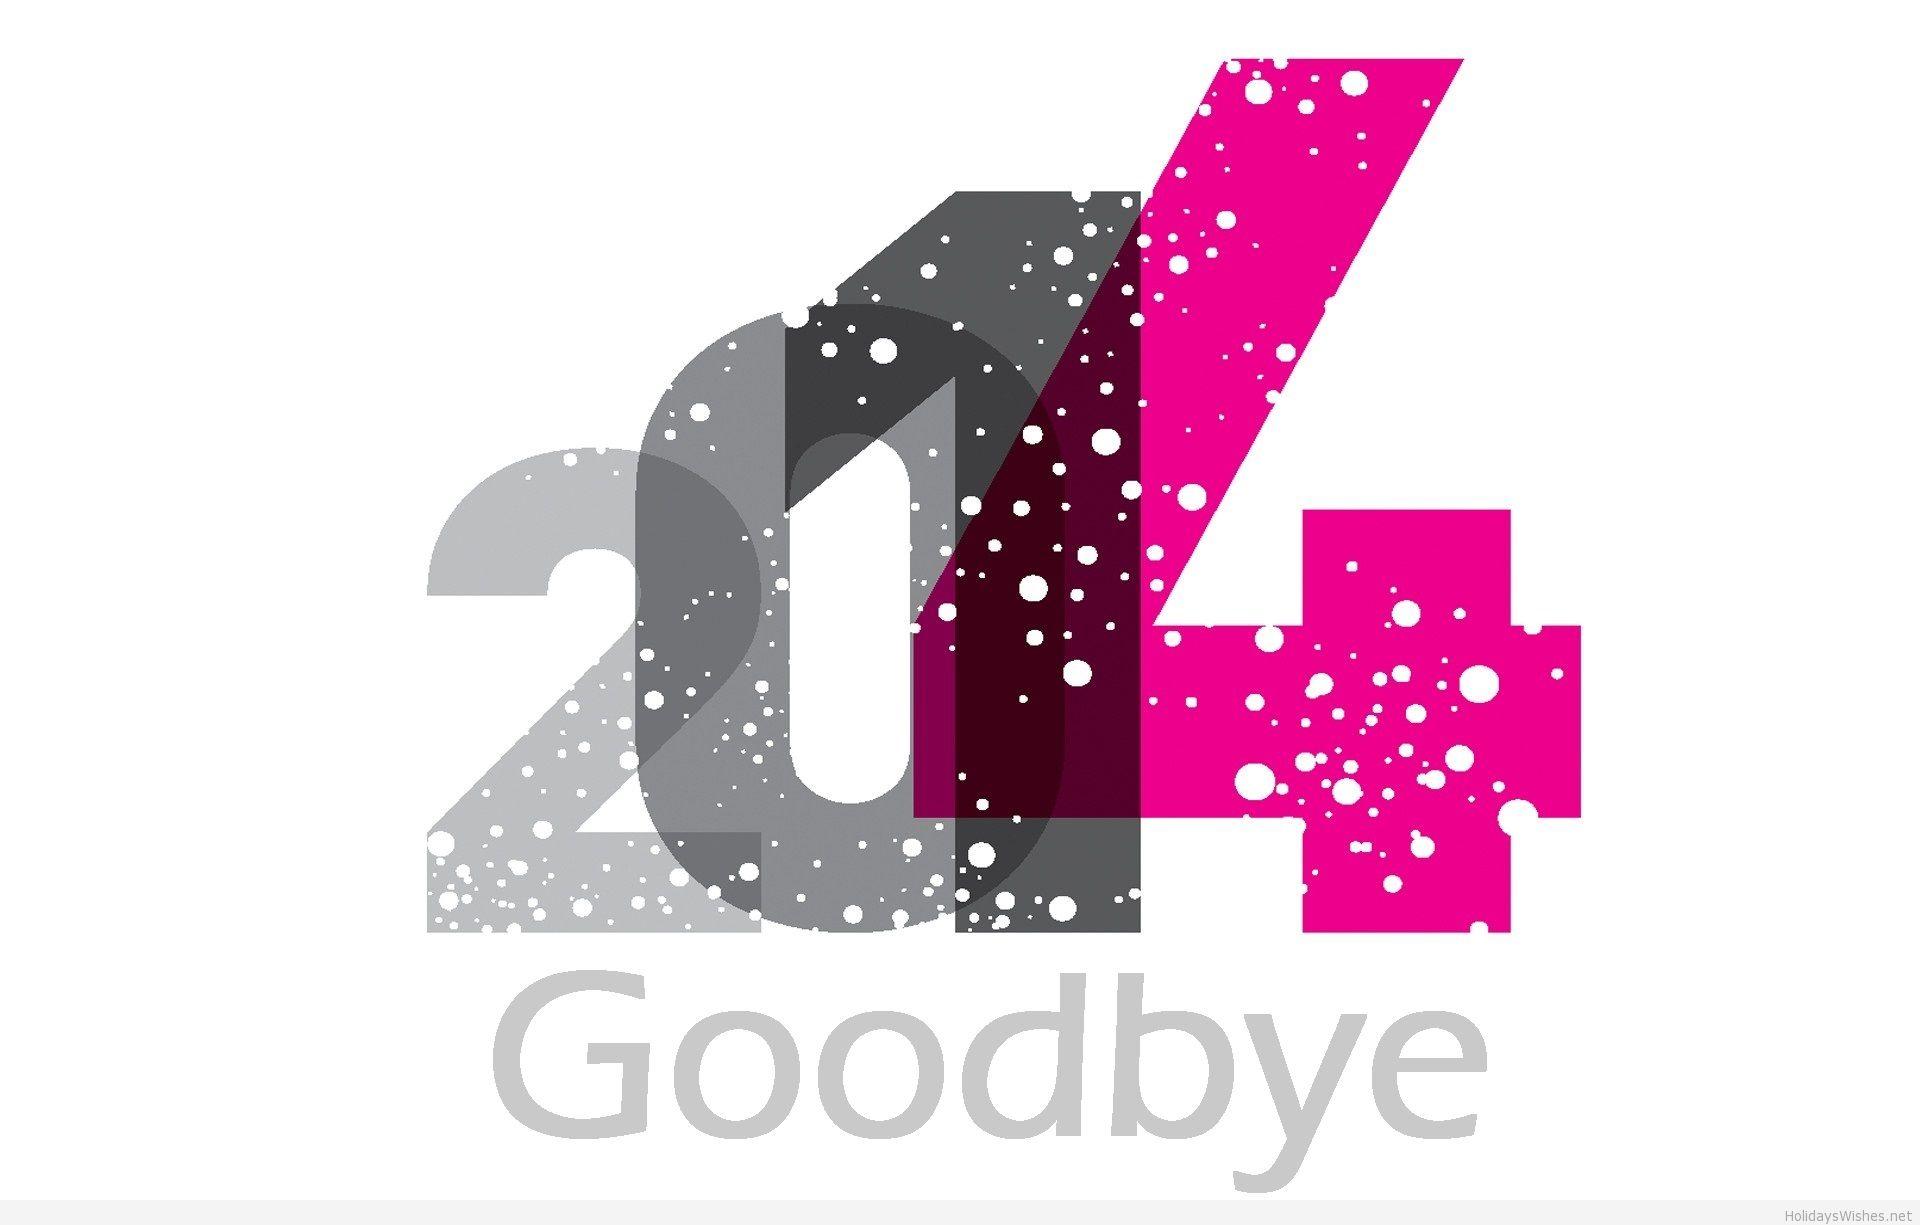 Goodbye-2014-Pink-and-grey-image